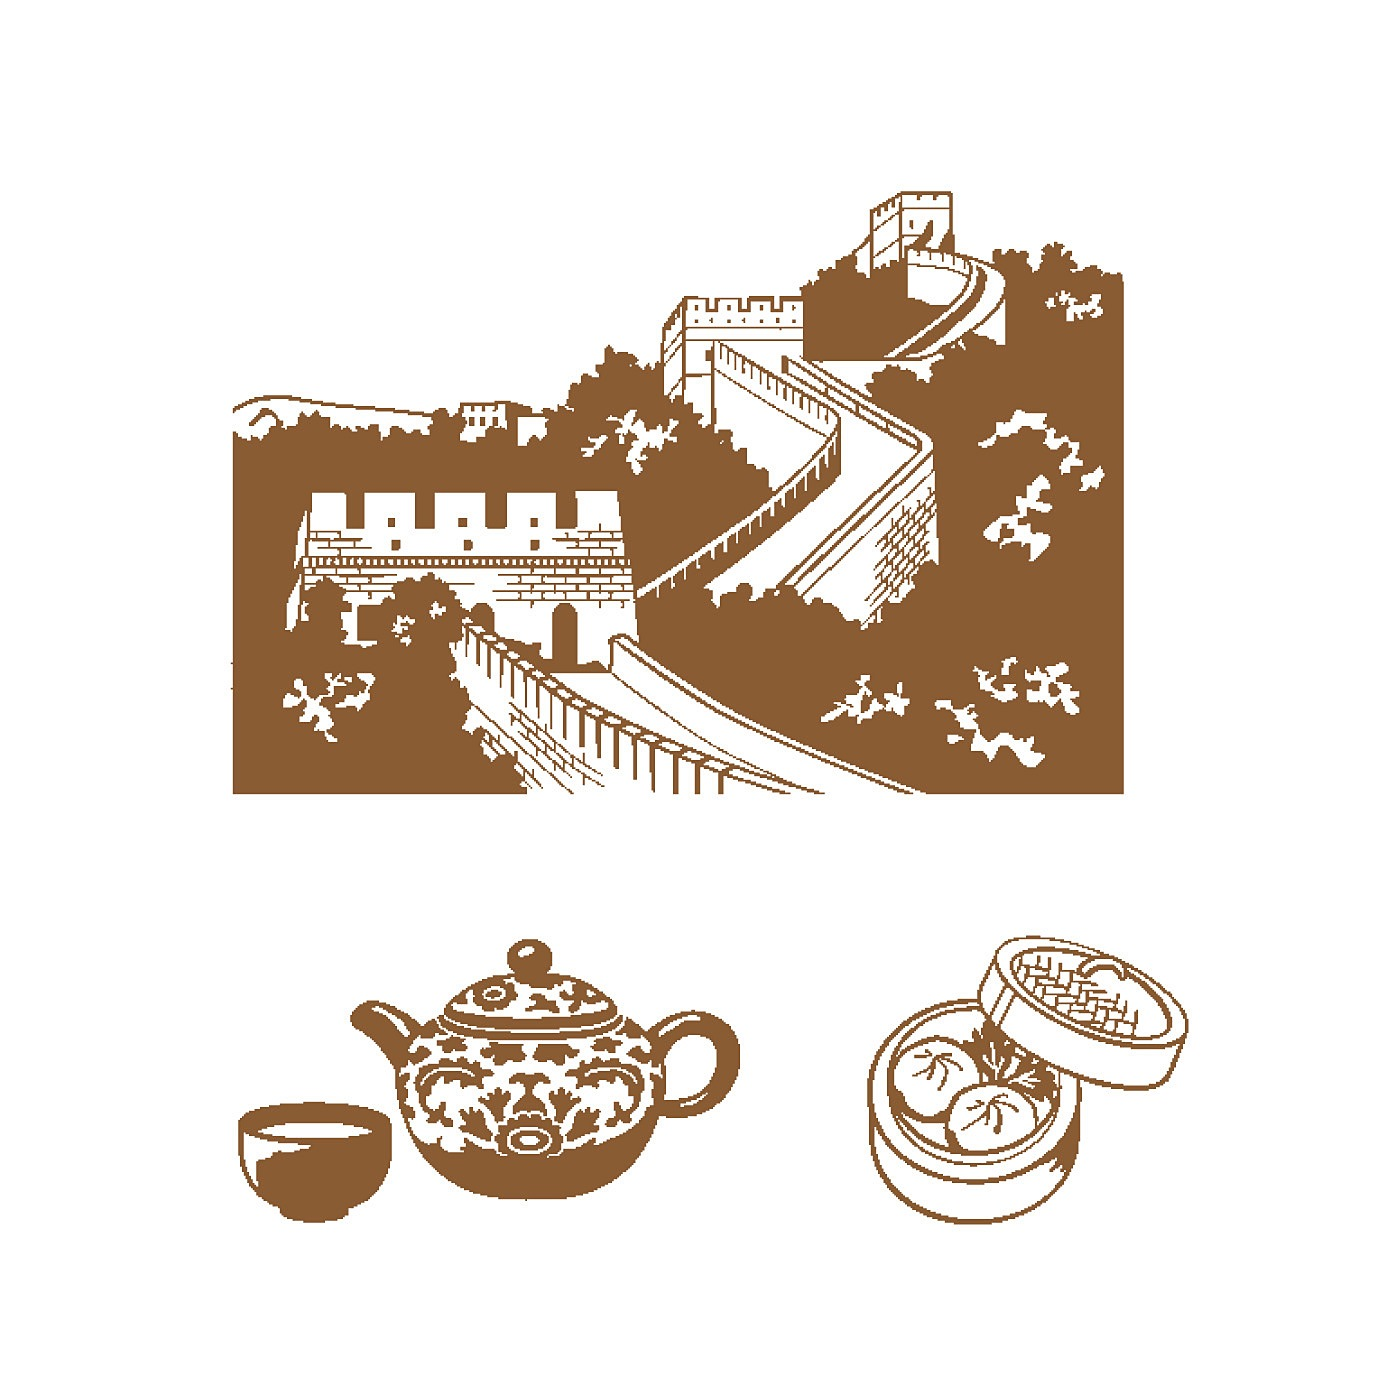 〈中国/万里の長城〉